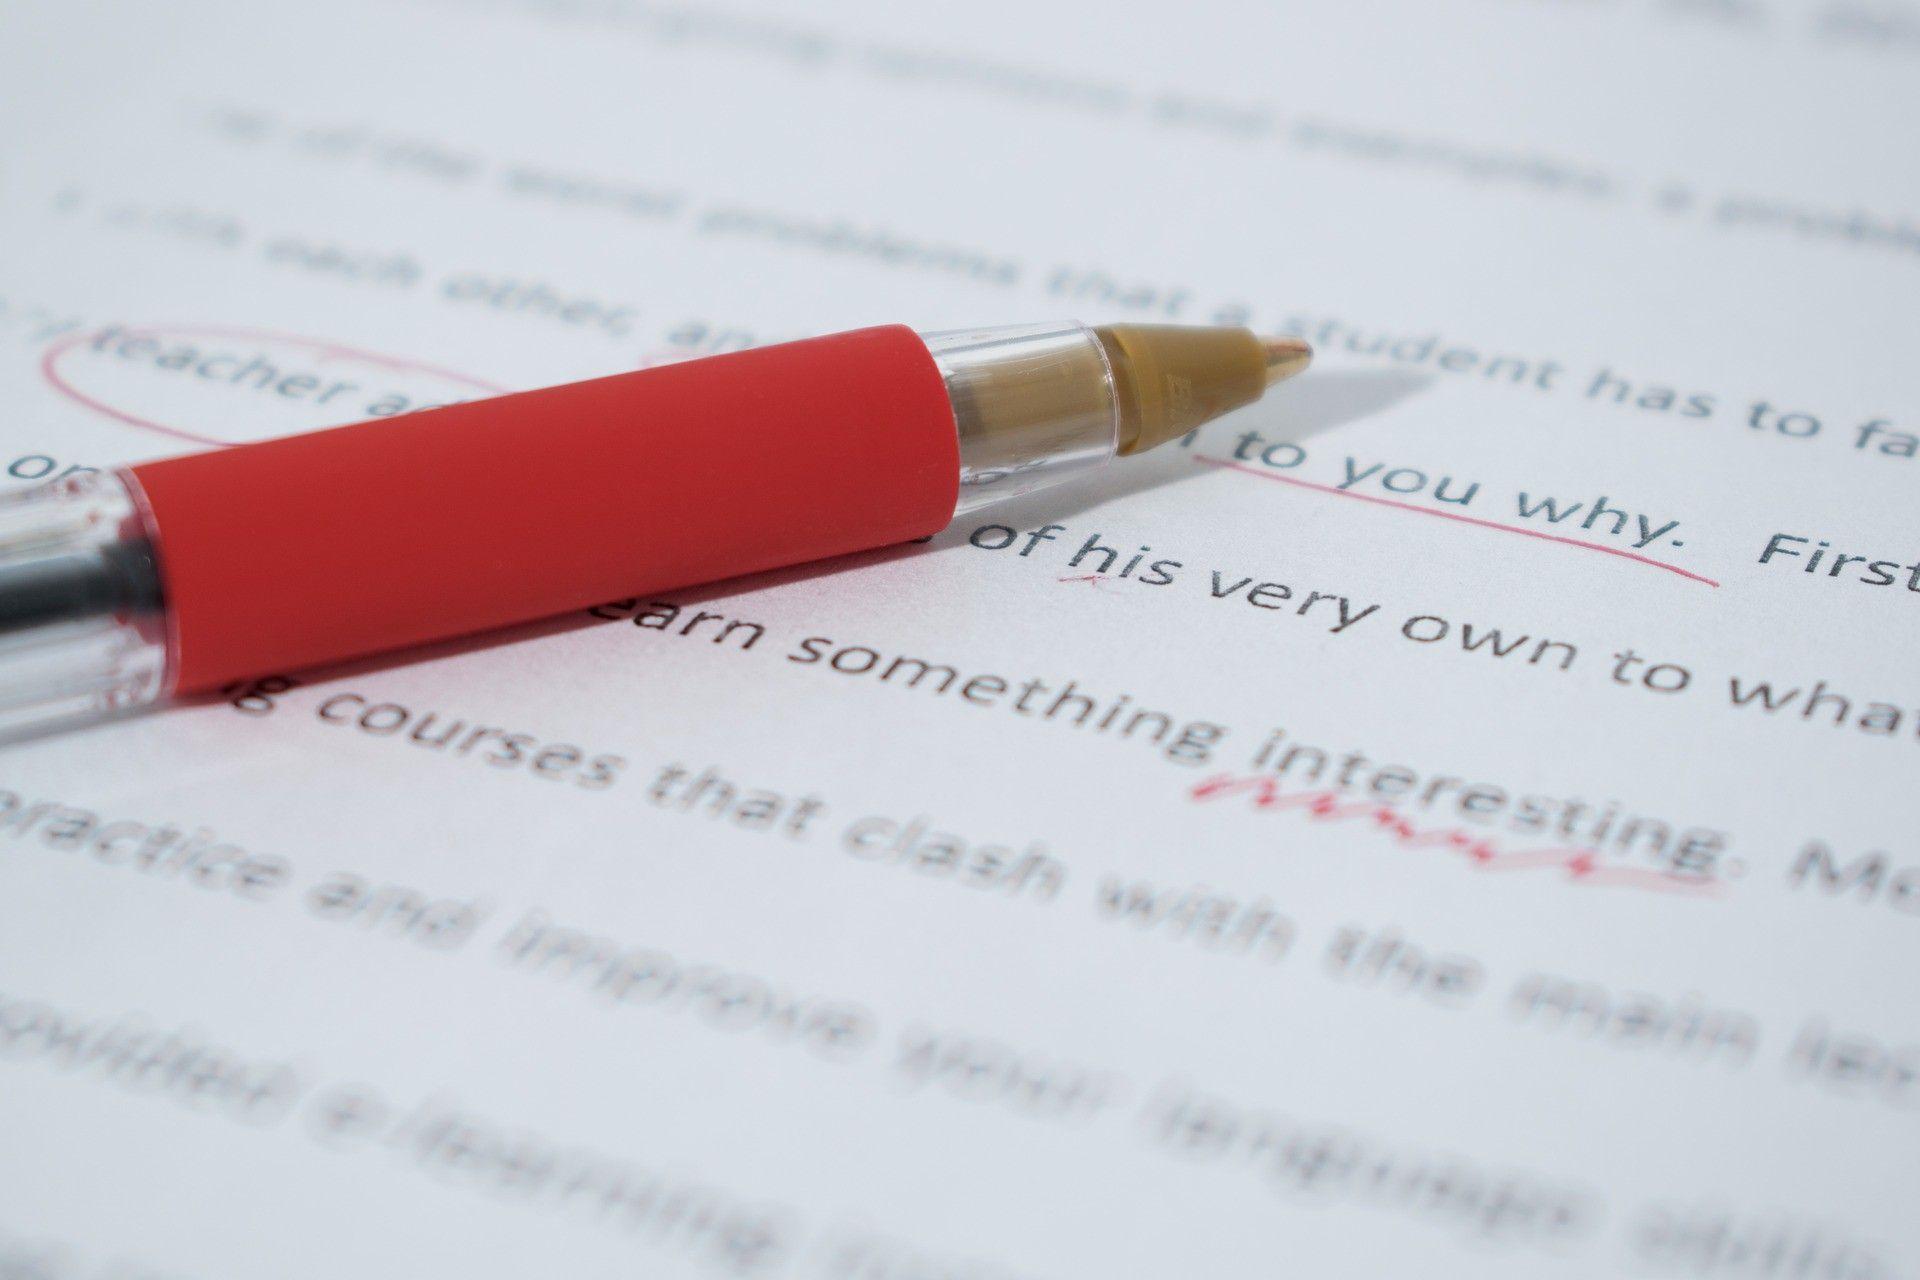 Is proofreading servicescom legit